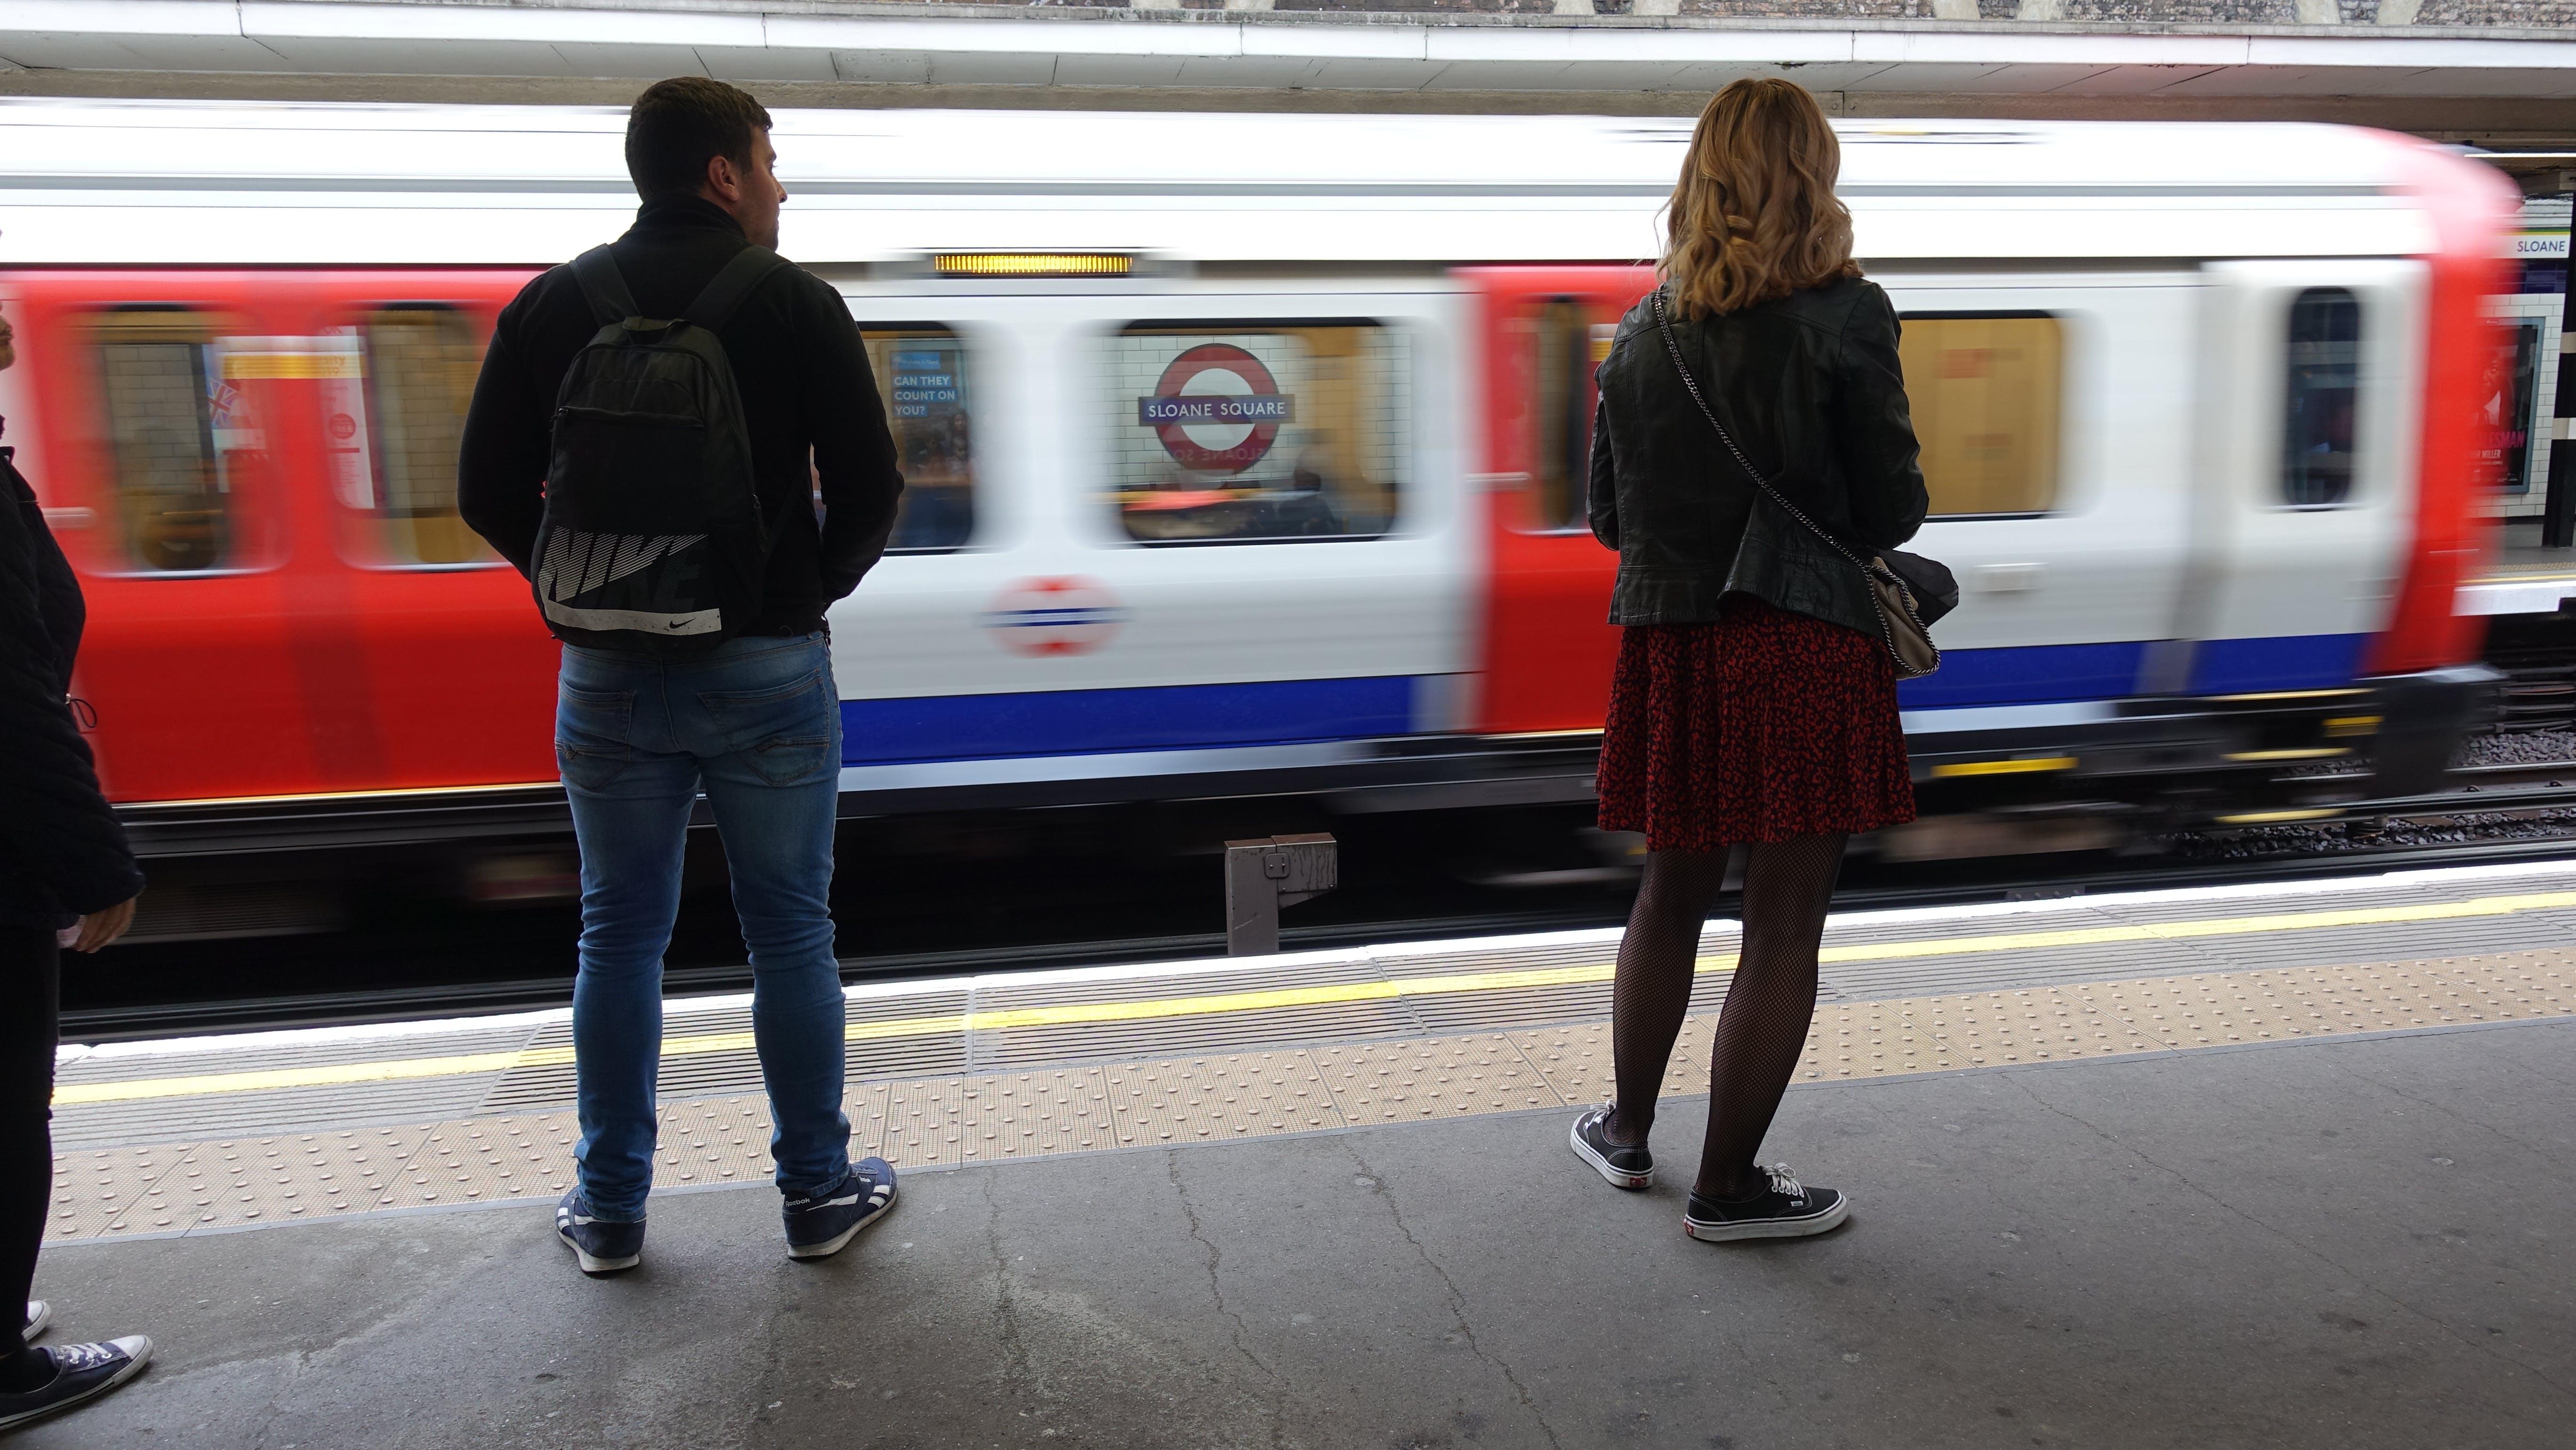 Free stock photo of #girl, miniskirt, subway, subway station